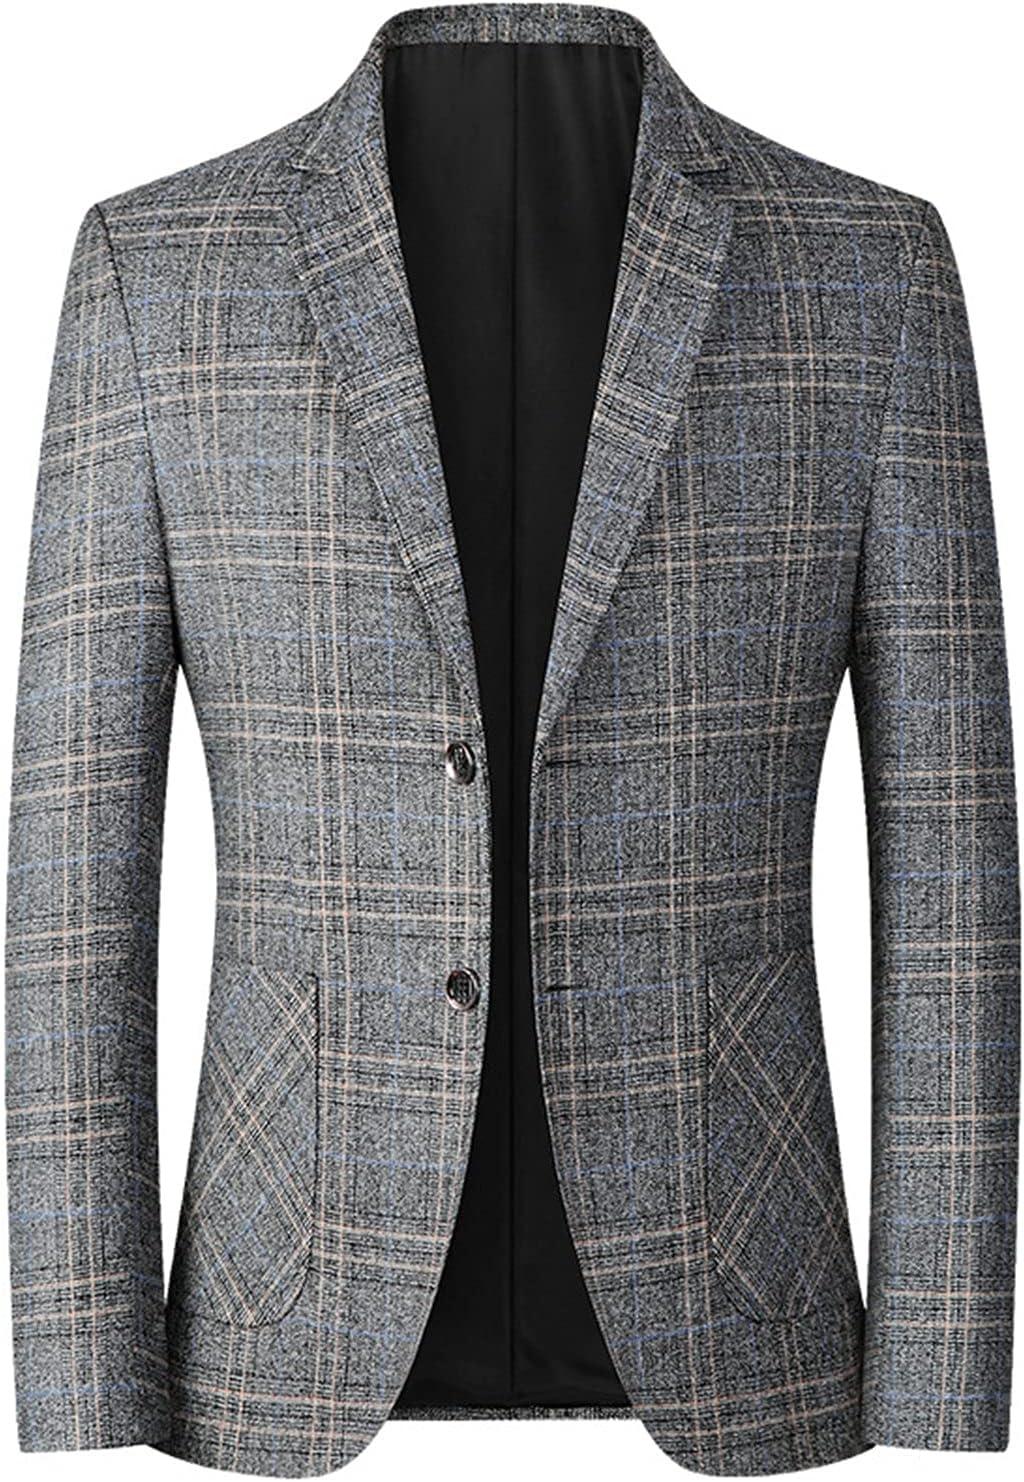 Men's Plaids Stylish Casual Blazer Jacket Cotton Notched Lapel Two Button Suits Coats Striped Business Blazers Coat (Gray,Medium)